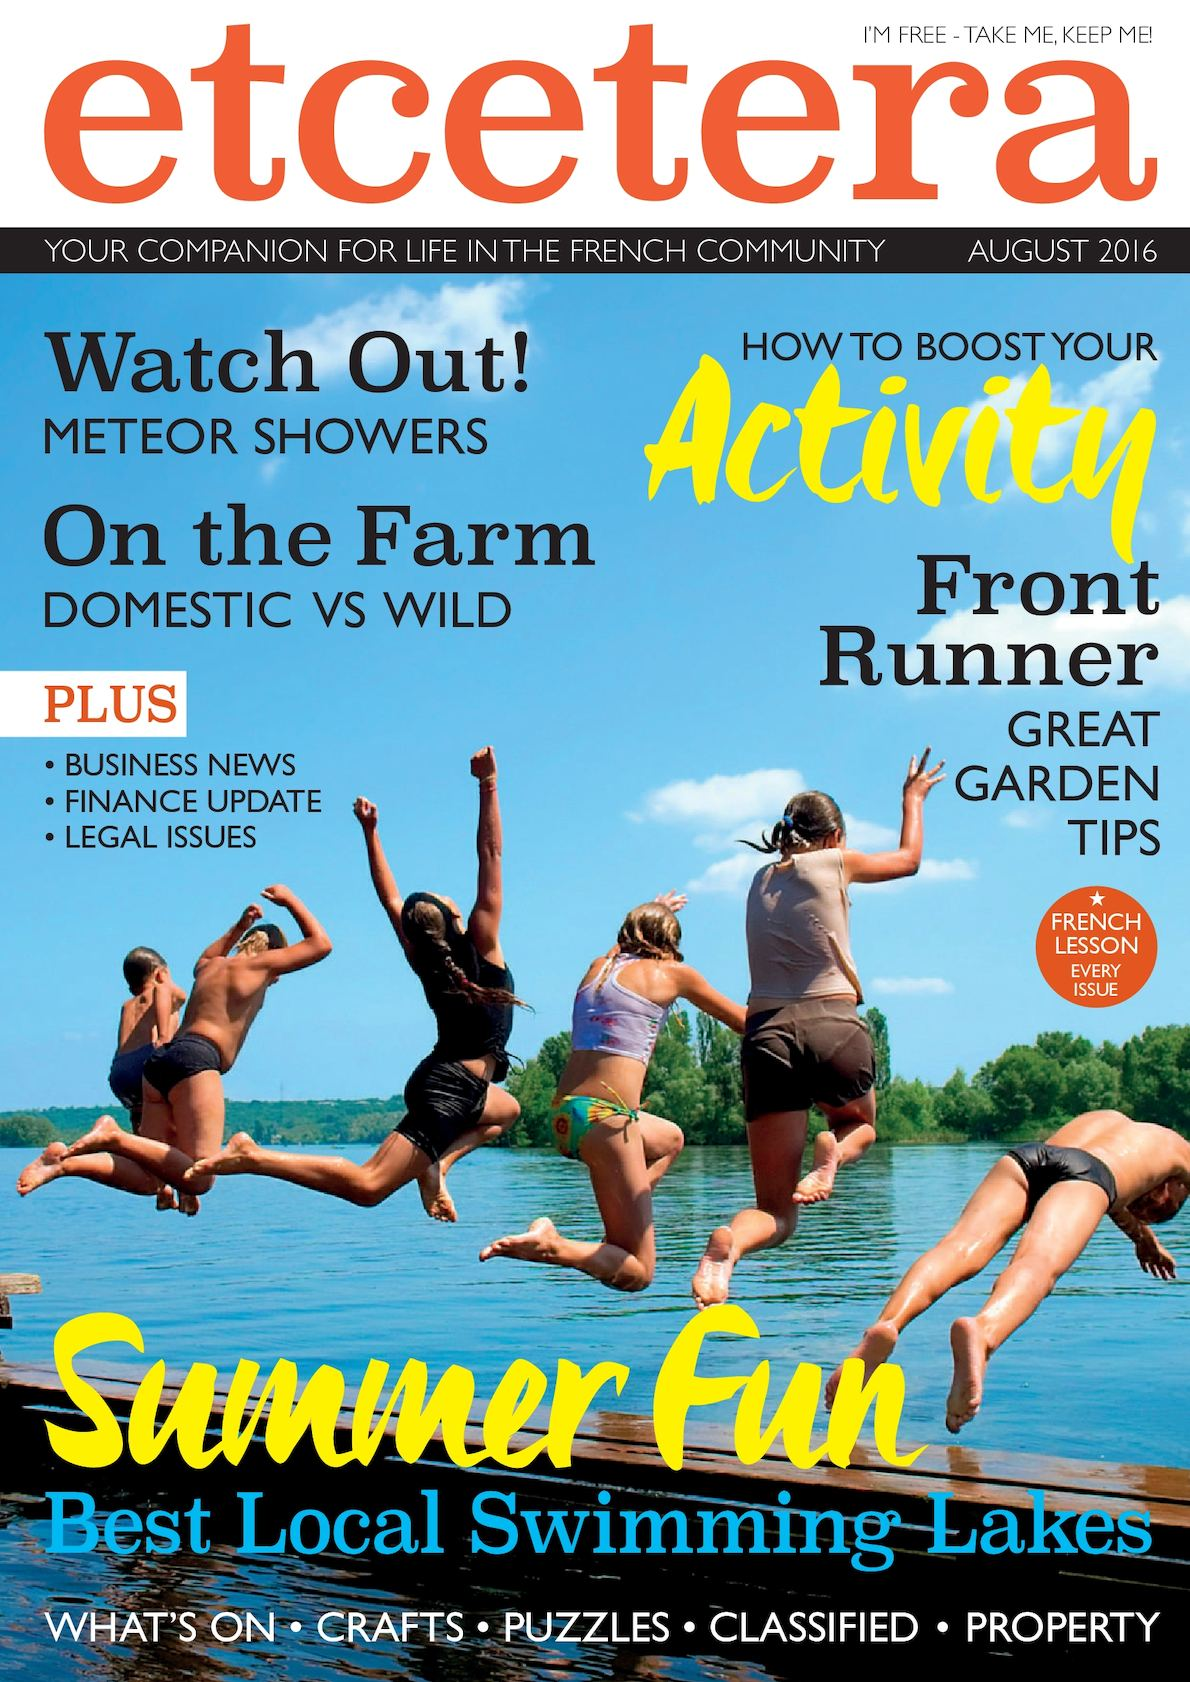 Calaméo August 2016 August Magazine Etcetera Calaméo WEDH29I